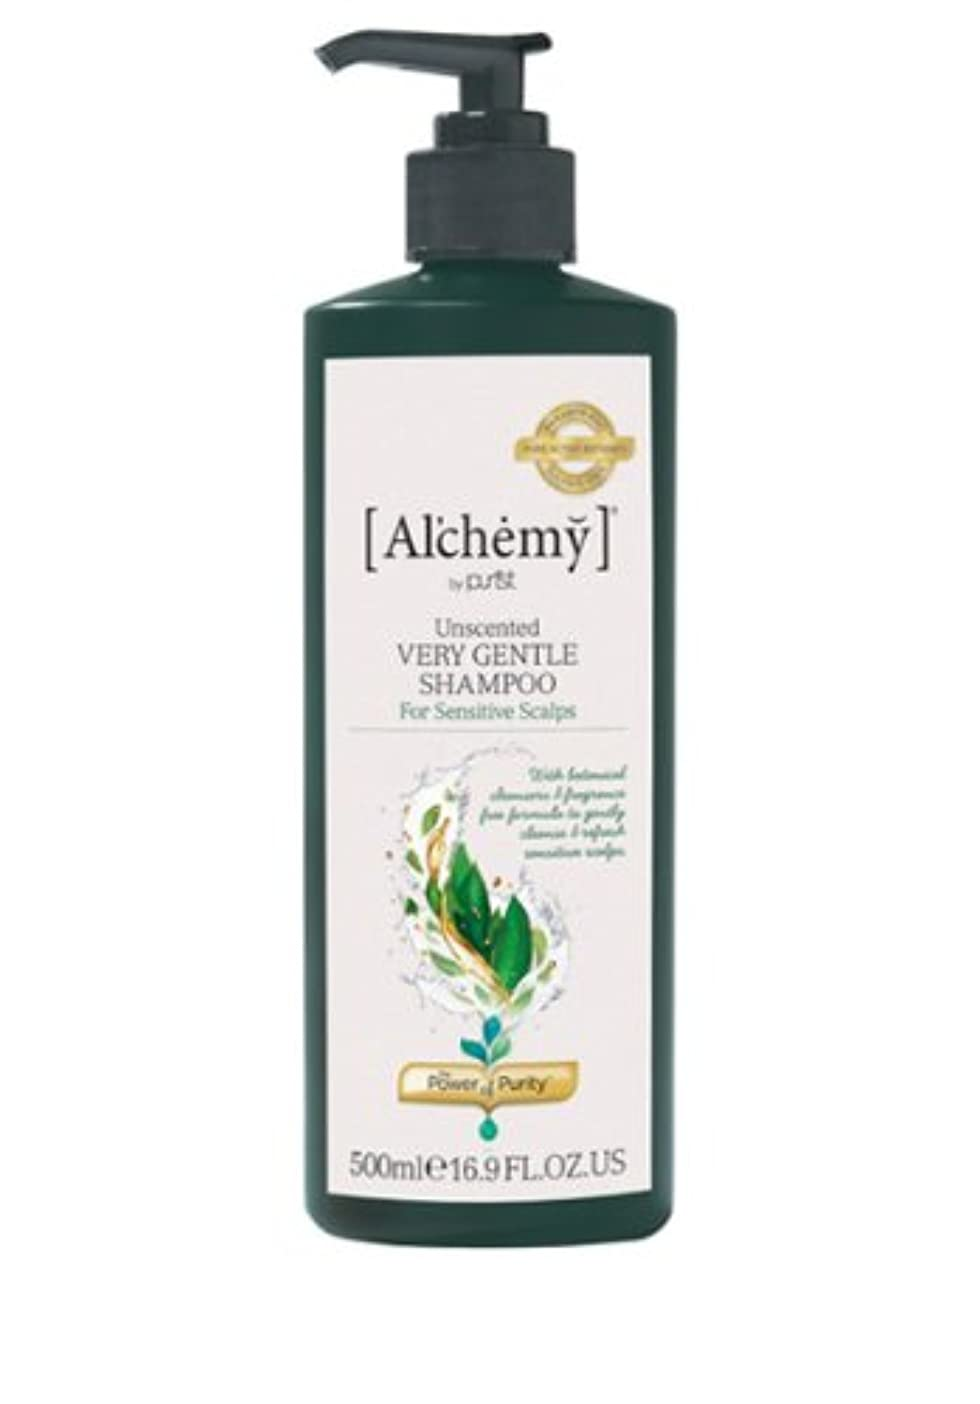 【Al'chemy(alchemy)】アルケミー ベリージェントルシャンプー(Unscented Very Gentle Shampoo)(敏感肌用)500ml